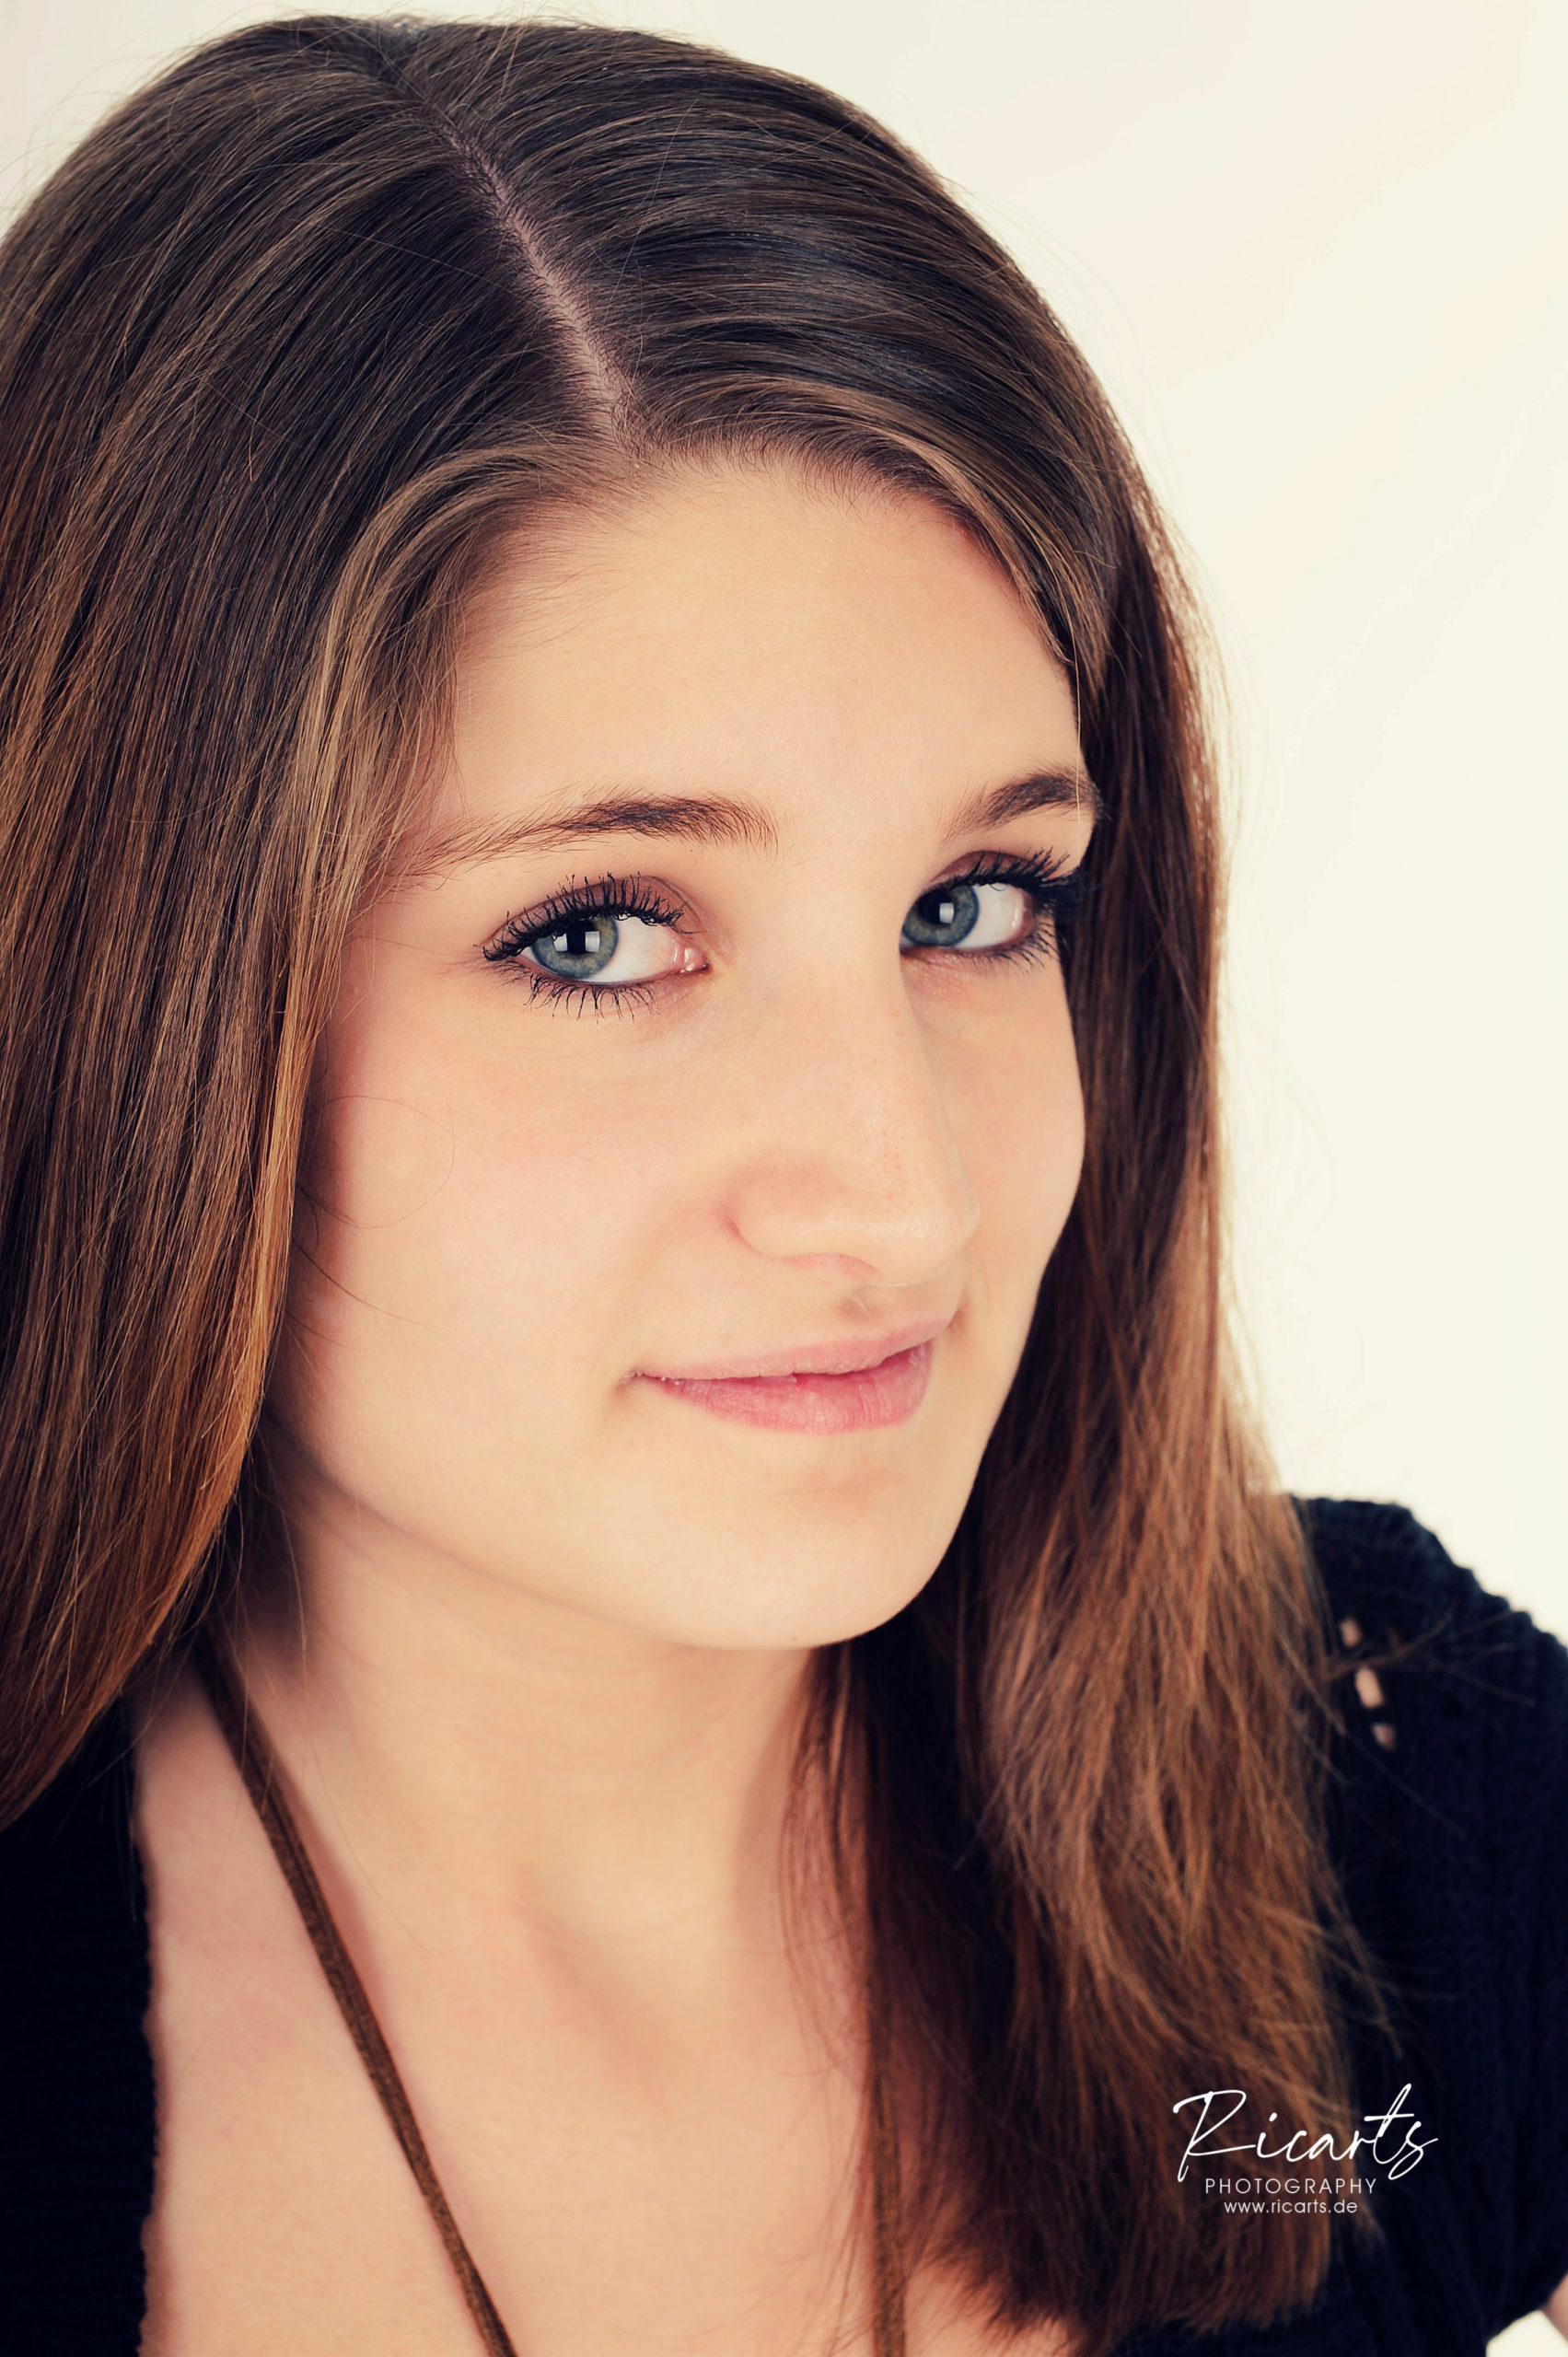 Portraitfoto junge Frau